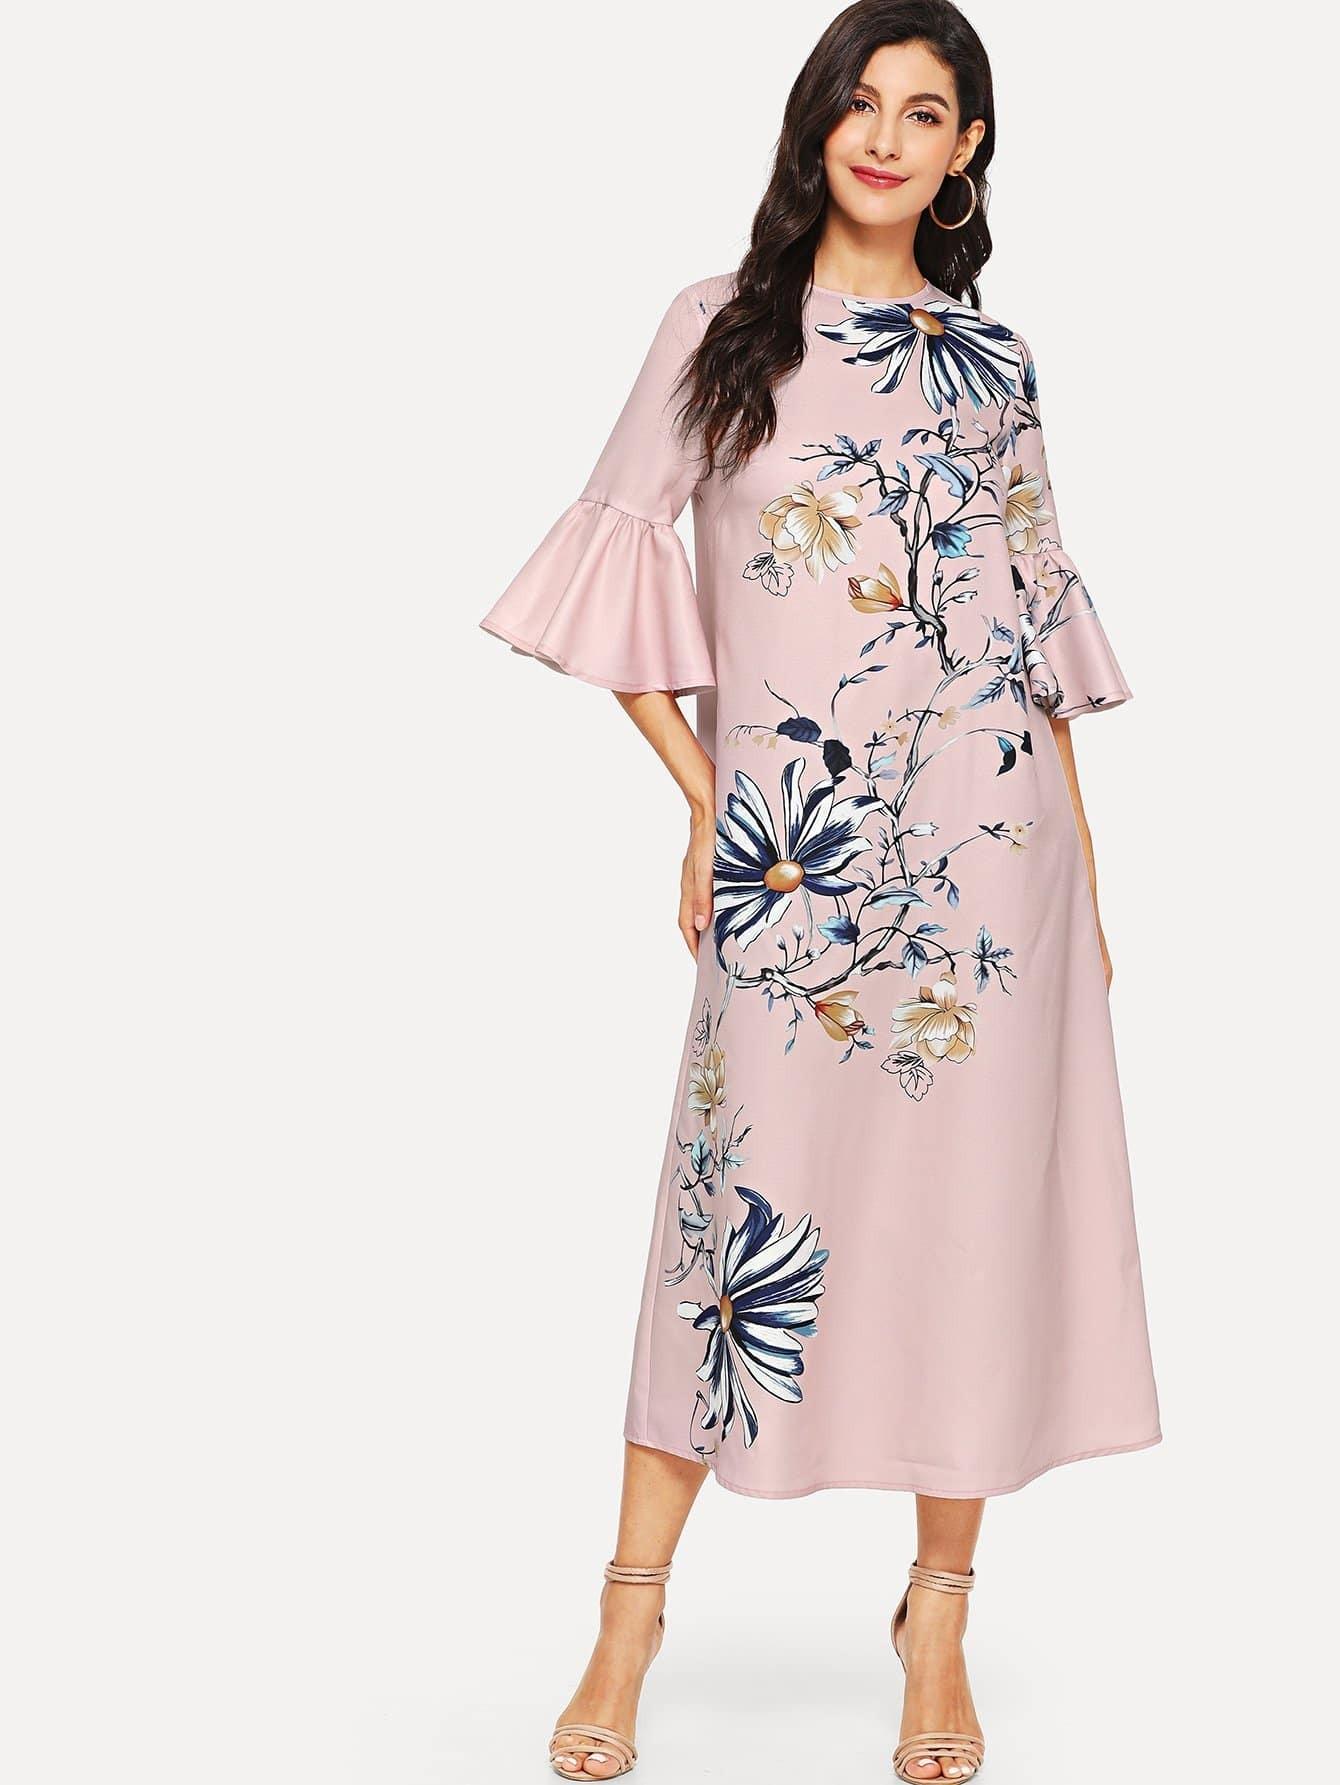 Купить Платье для печати втулки из трусика, Jeane, SheIn